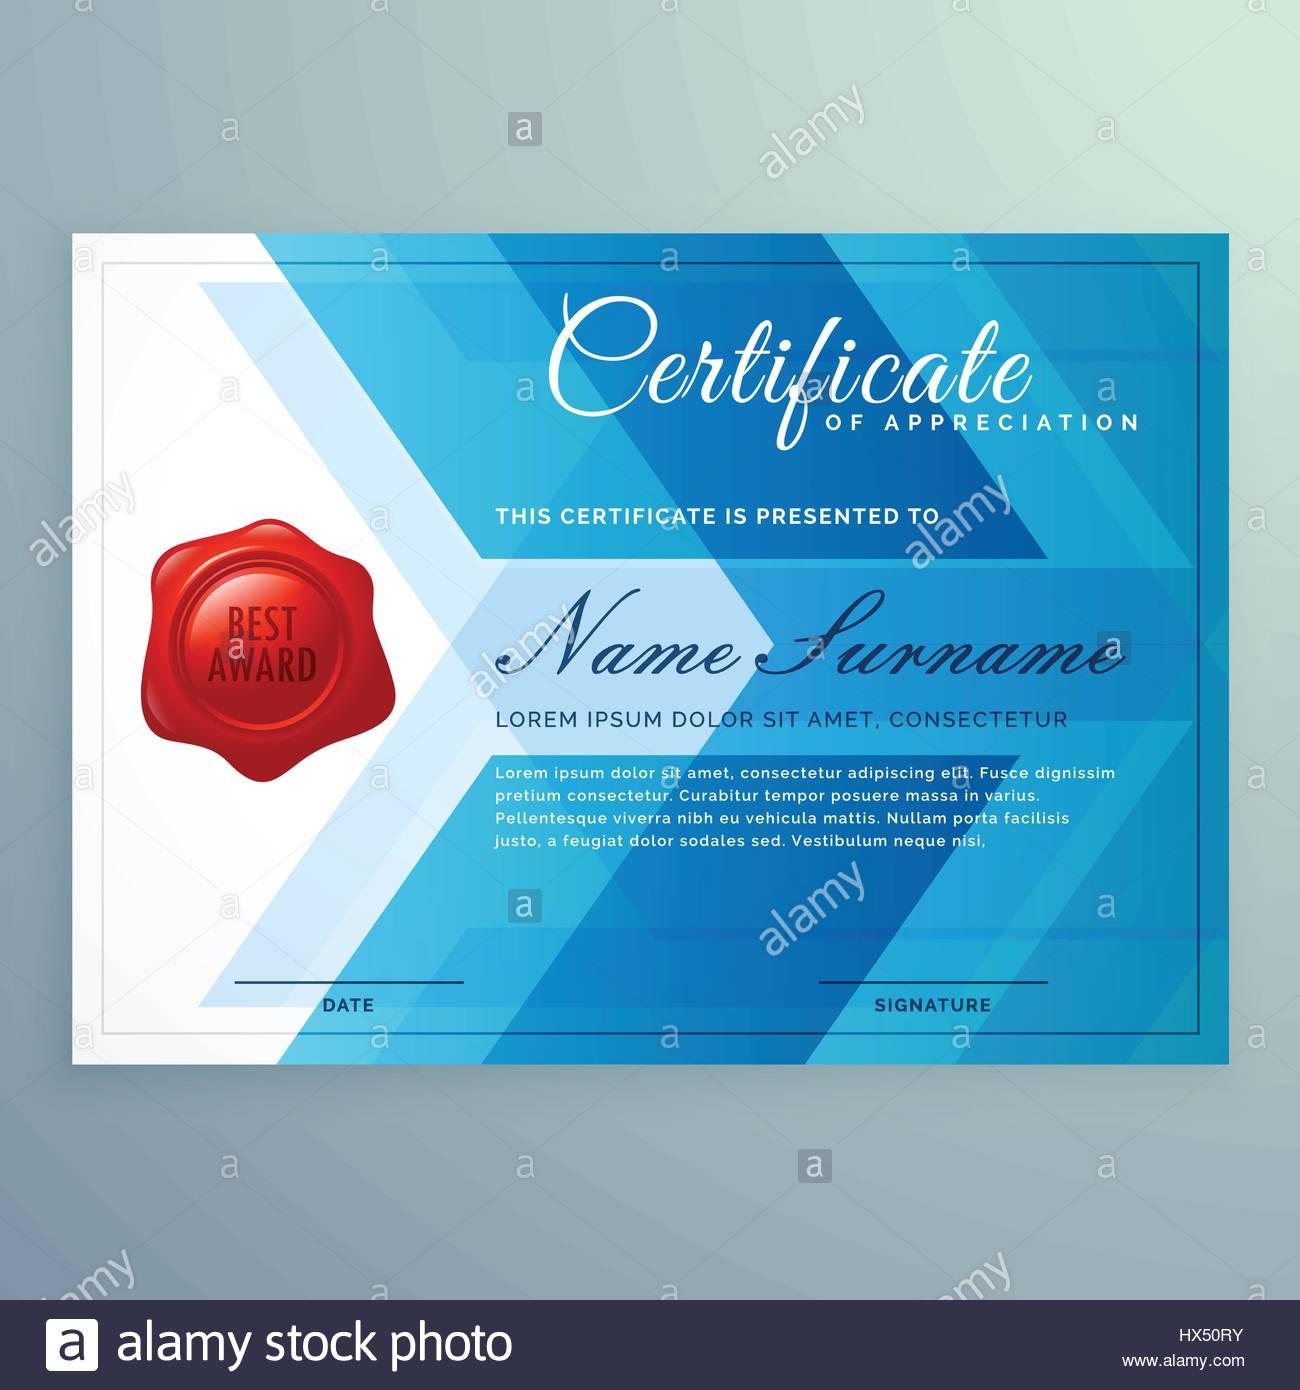 Blue Diploma Stockfotos & Blue Diploma Bilder - Seite 2 - Alamy